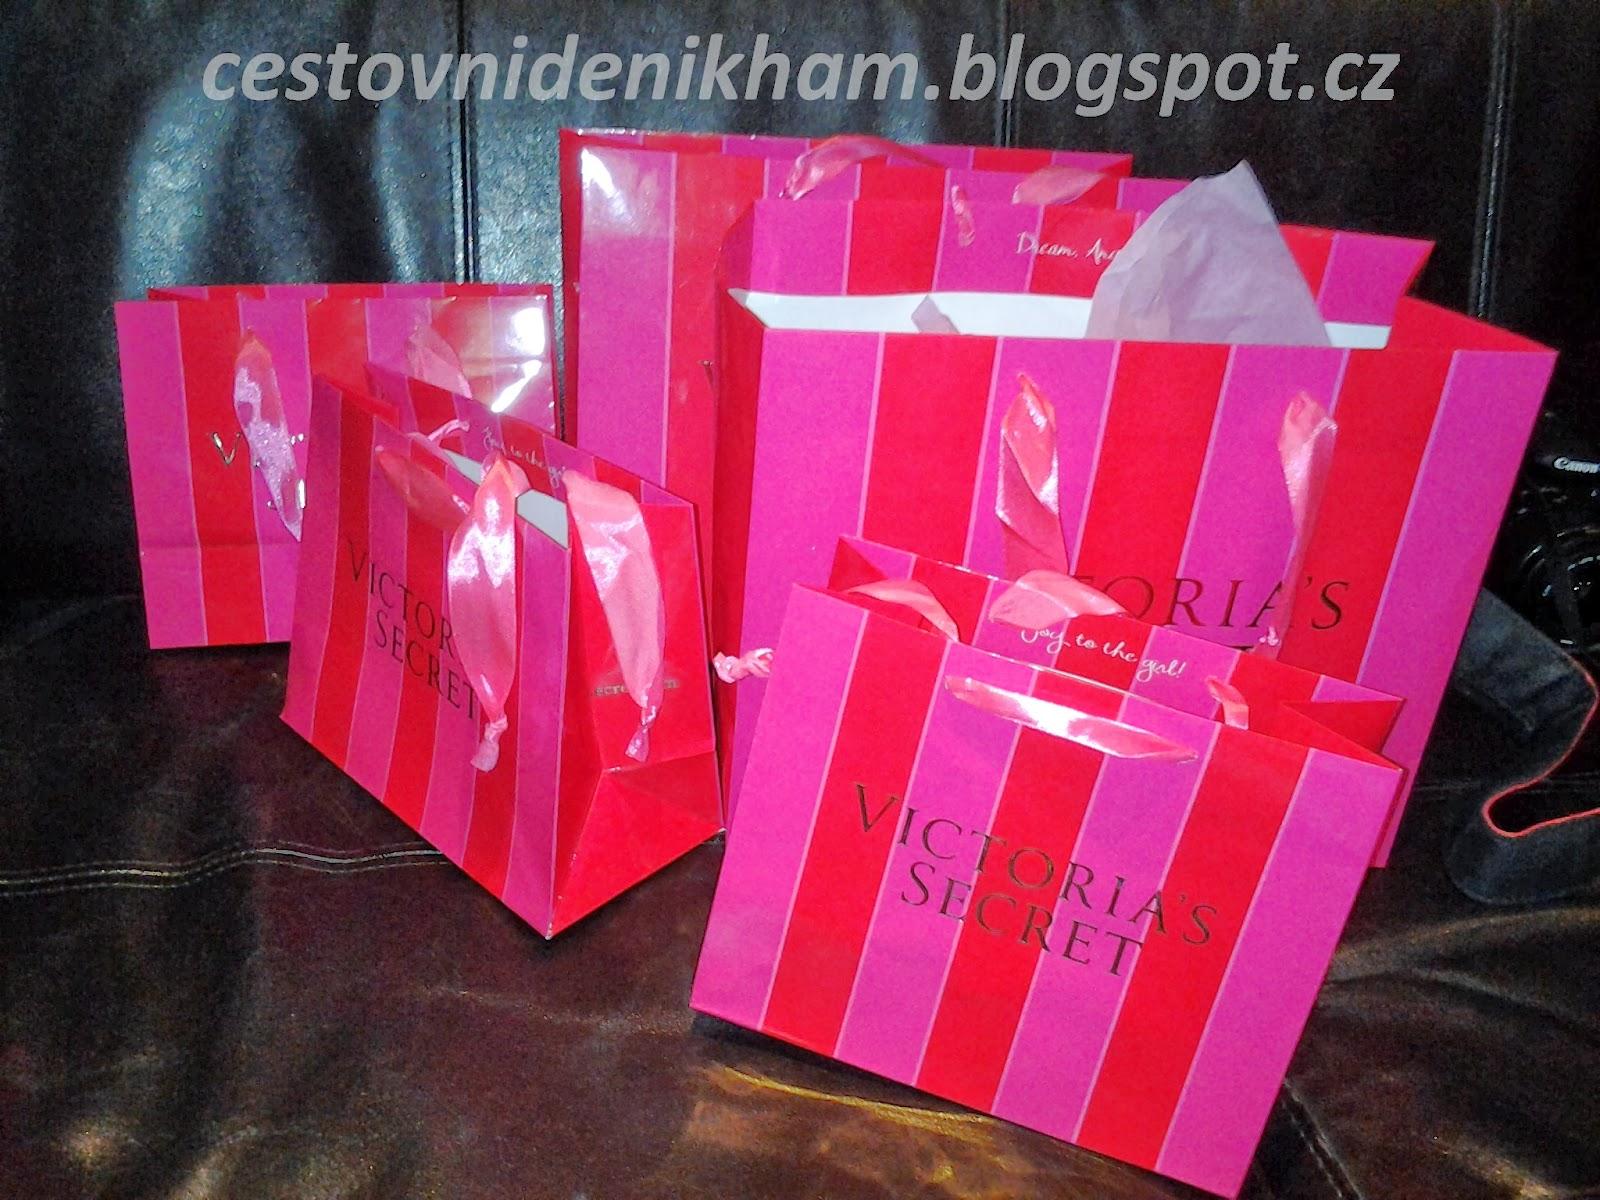 nákup u Viktorie // shopping at Victoria´s Secret